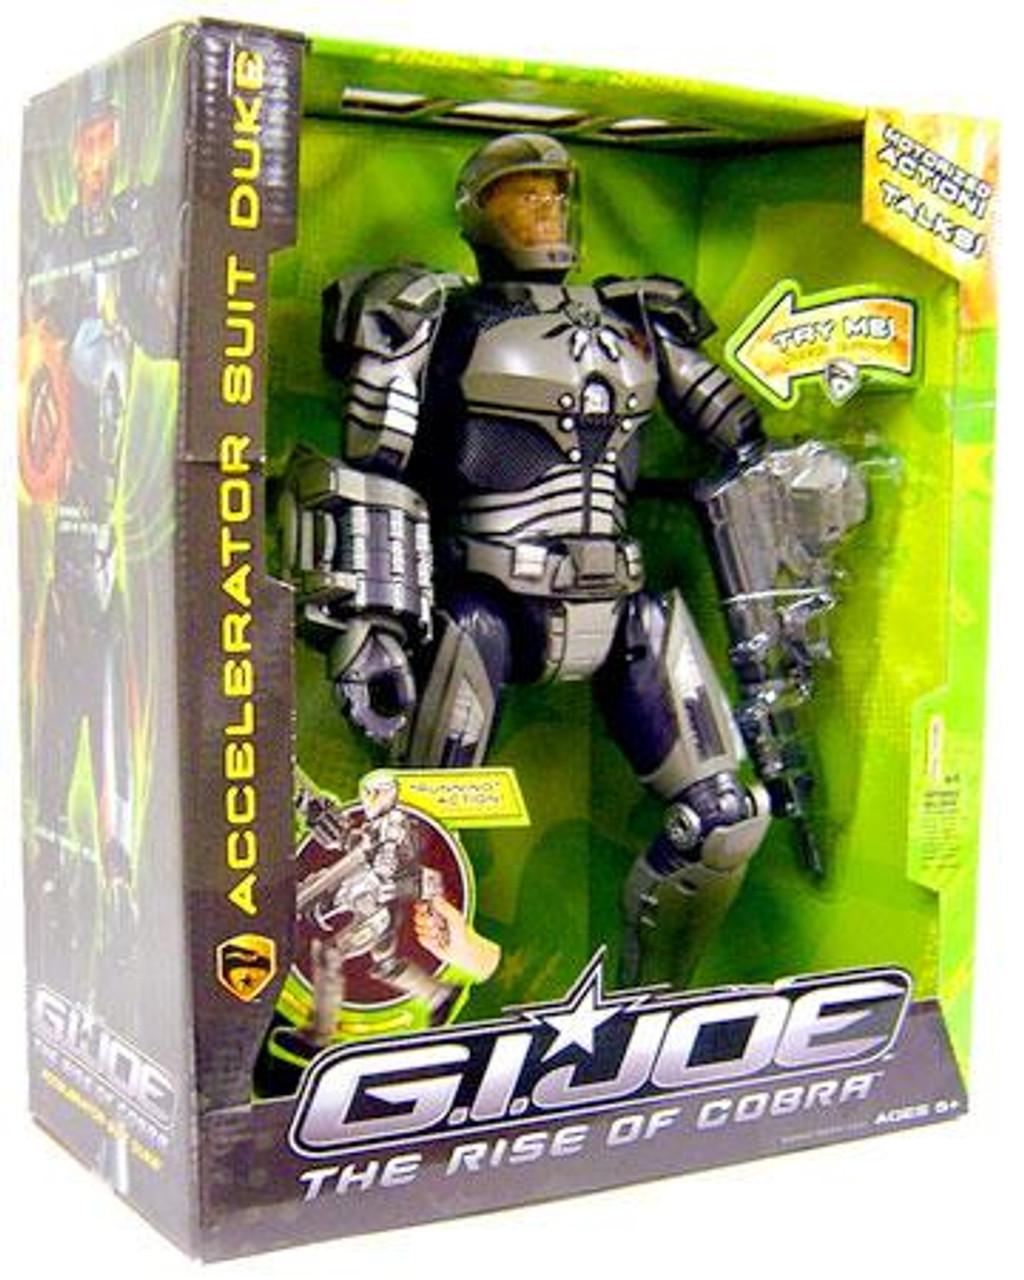 GI Joe The Rise of Cobra Accelerator Suit Duke Action Figure